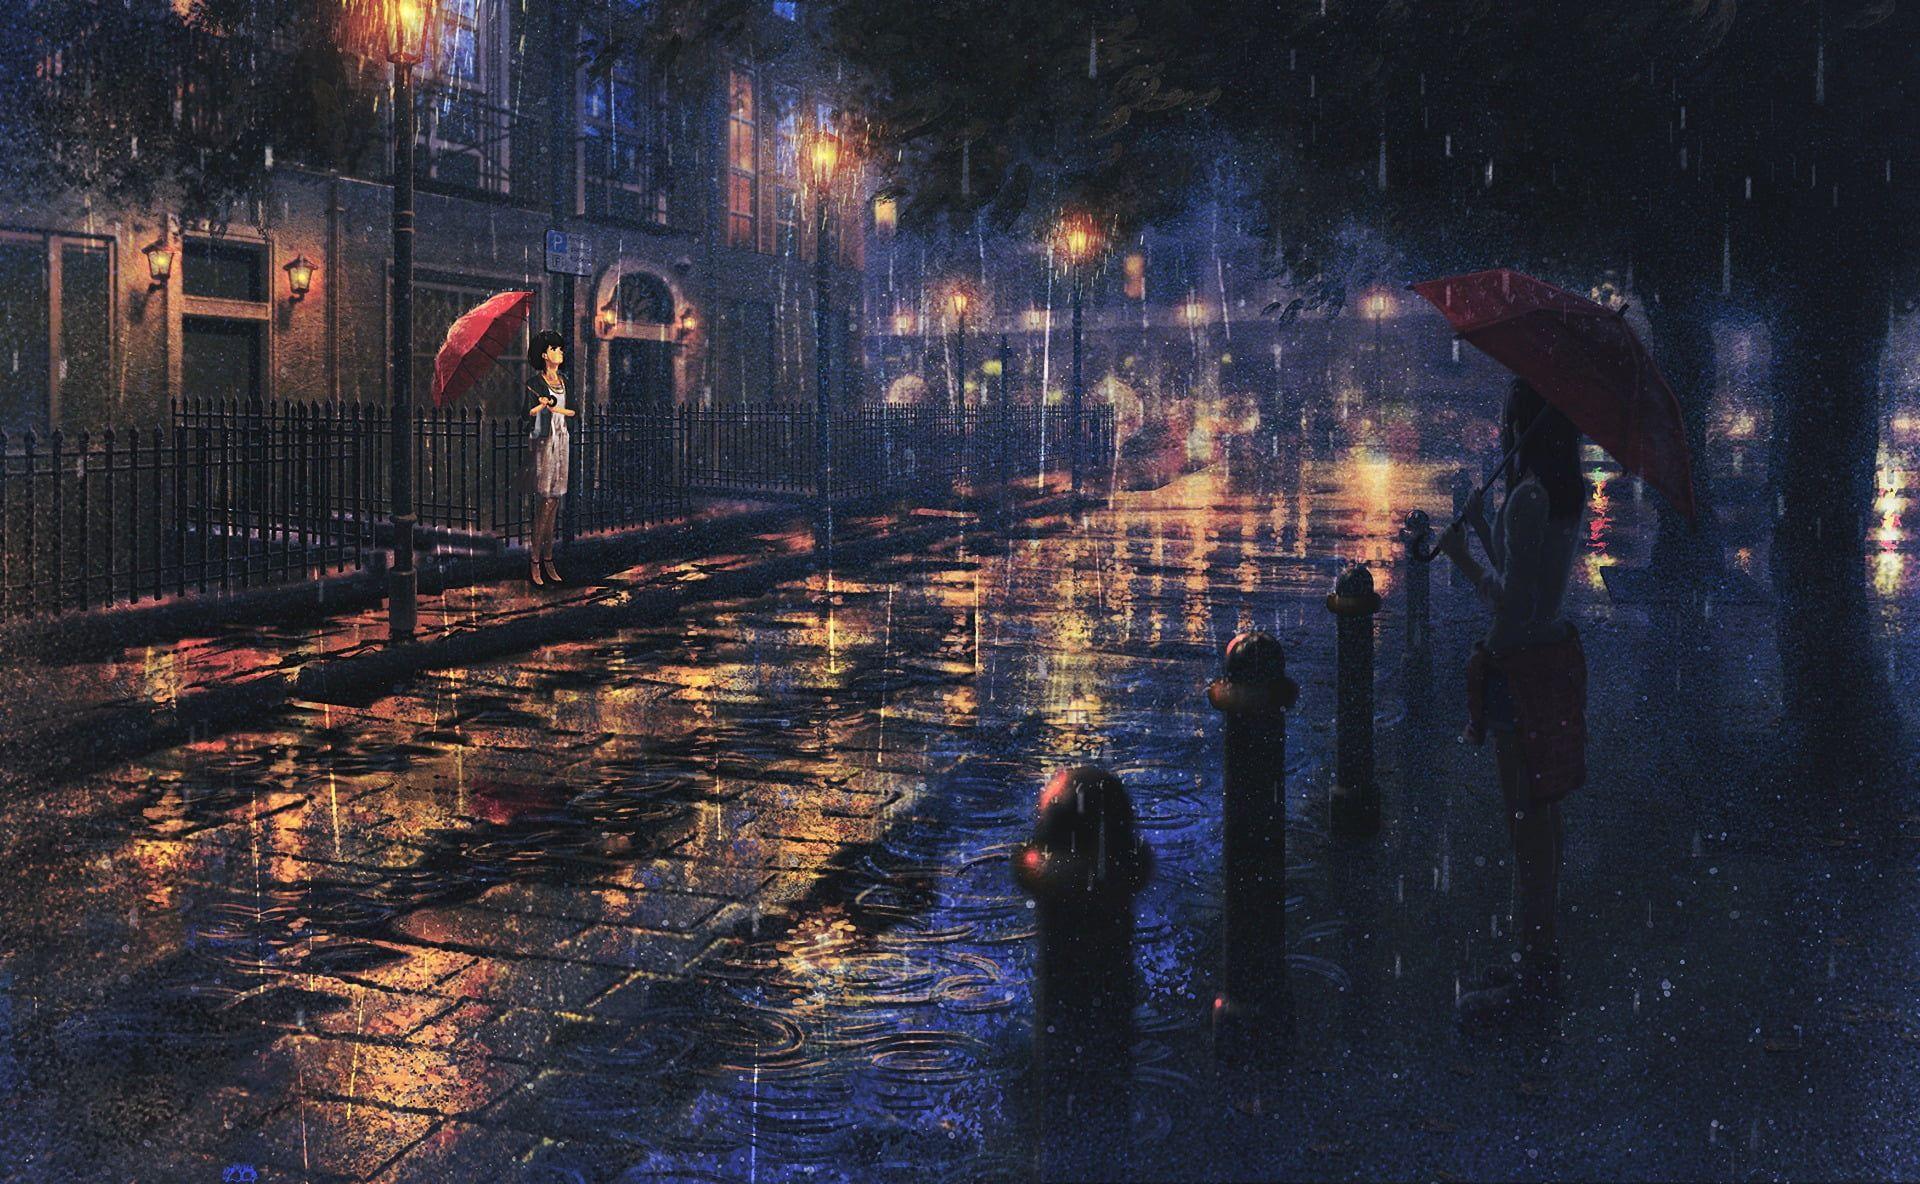 Anime Anime Girls Artwork Rain Umbrella 1080p Wallpaper Hdwallpaper Desktop Rain Wallpapers Anime Scenery Anime Background